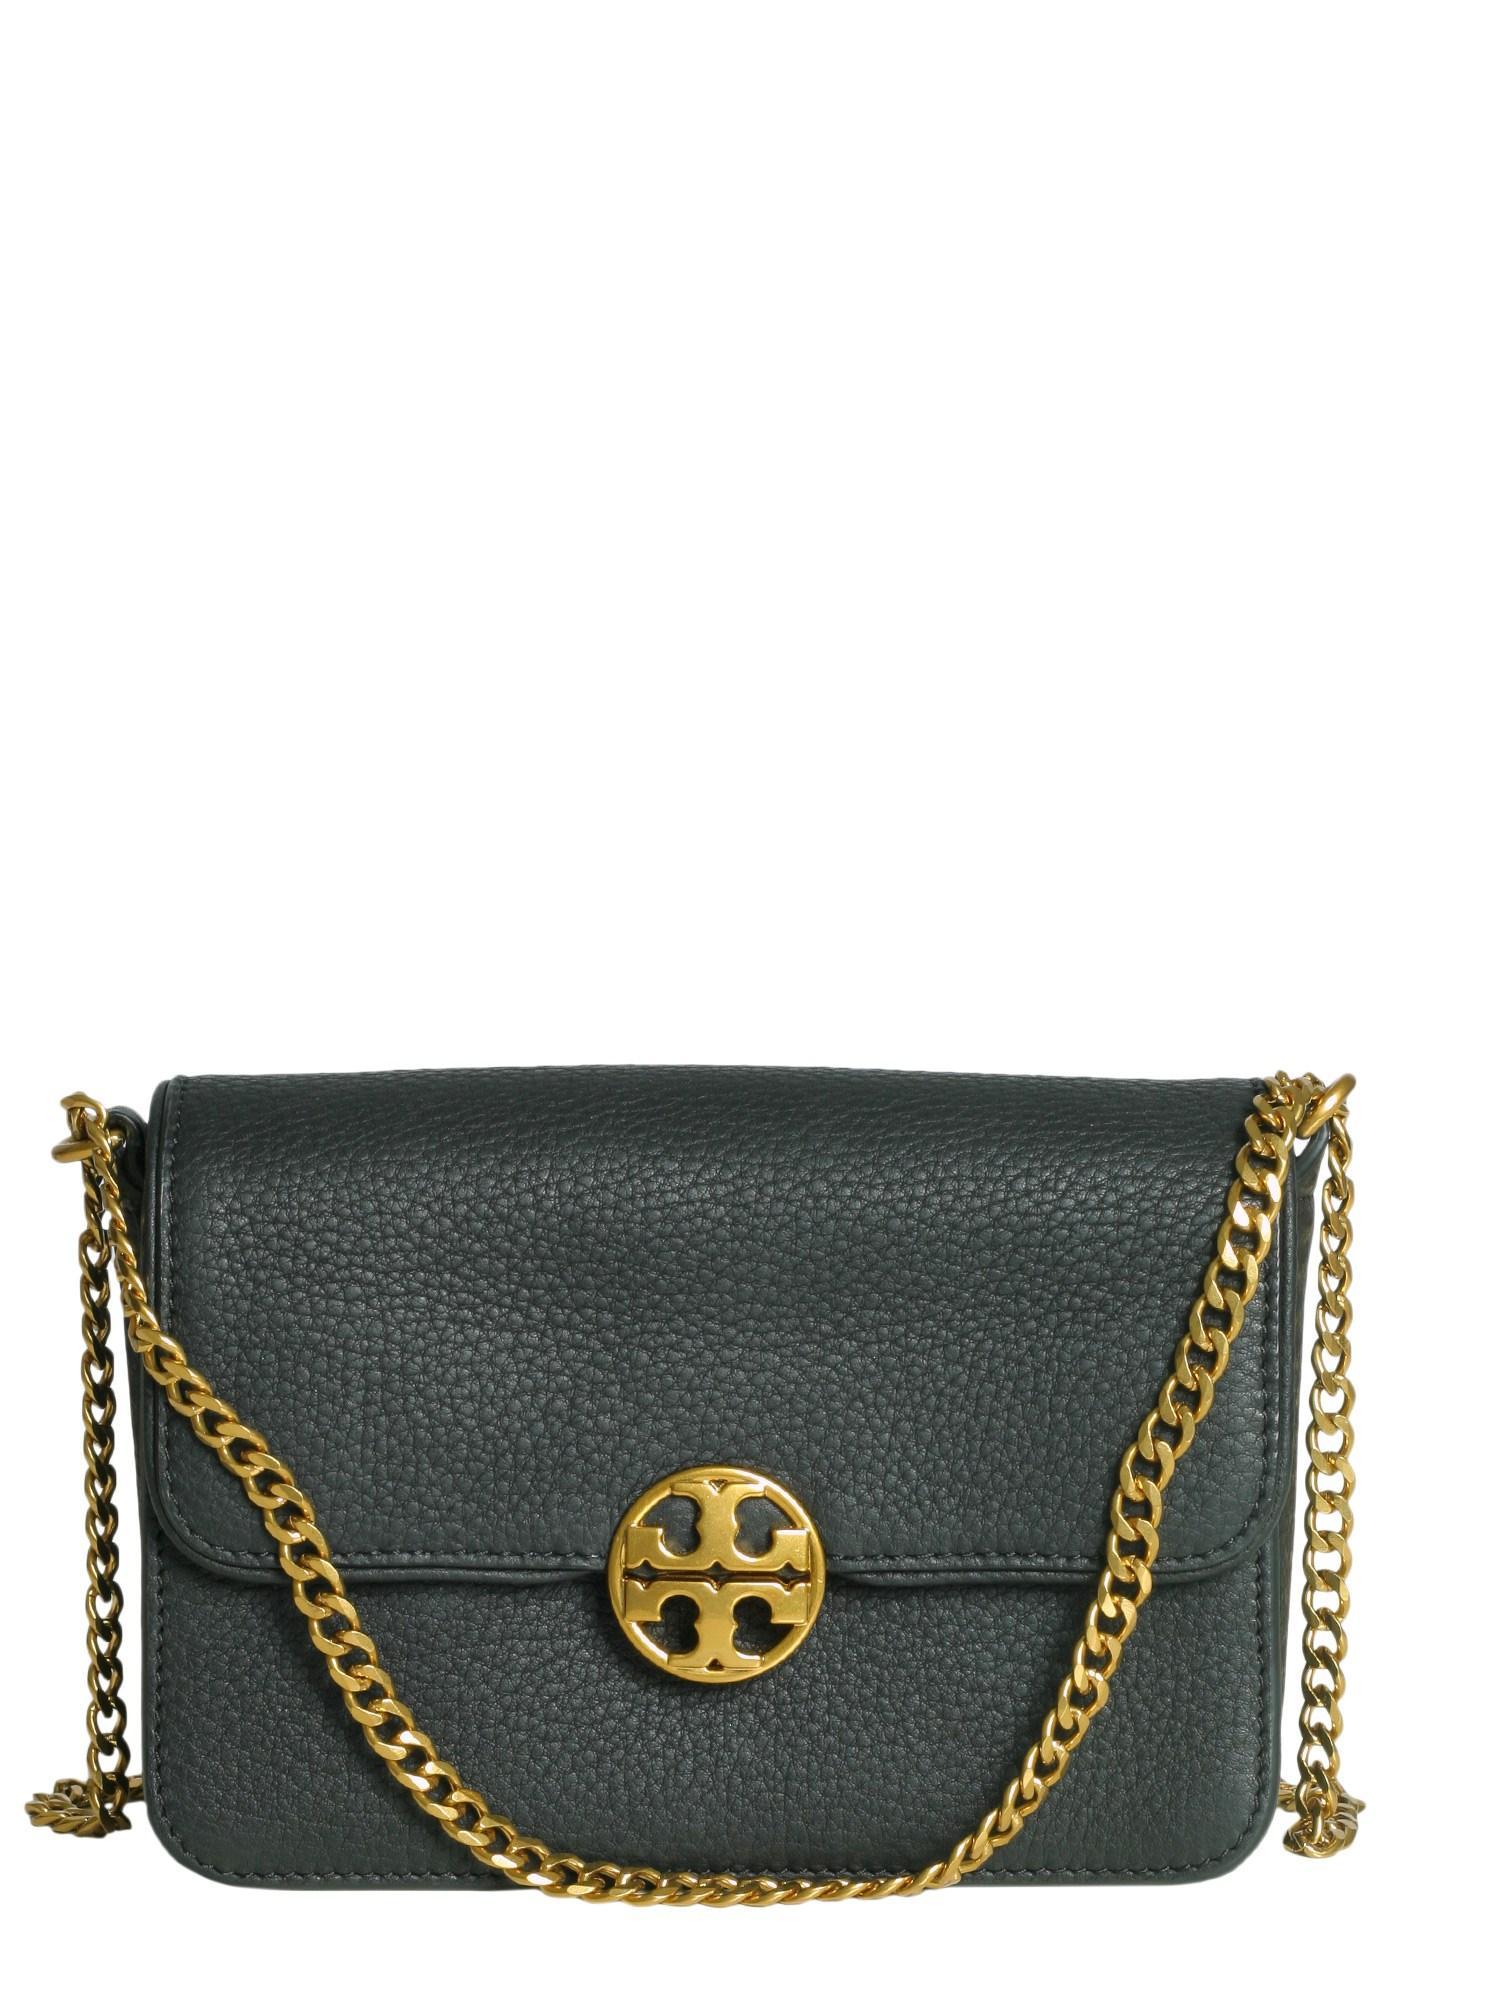 babaa5f7826 Tory Burch Chelsea Crossbody Bag In Black